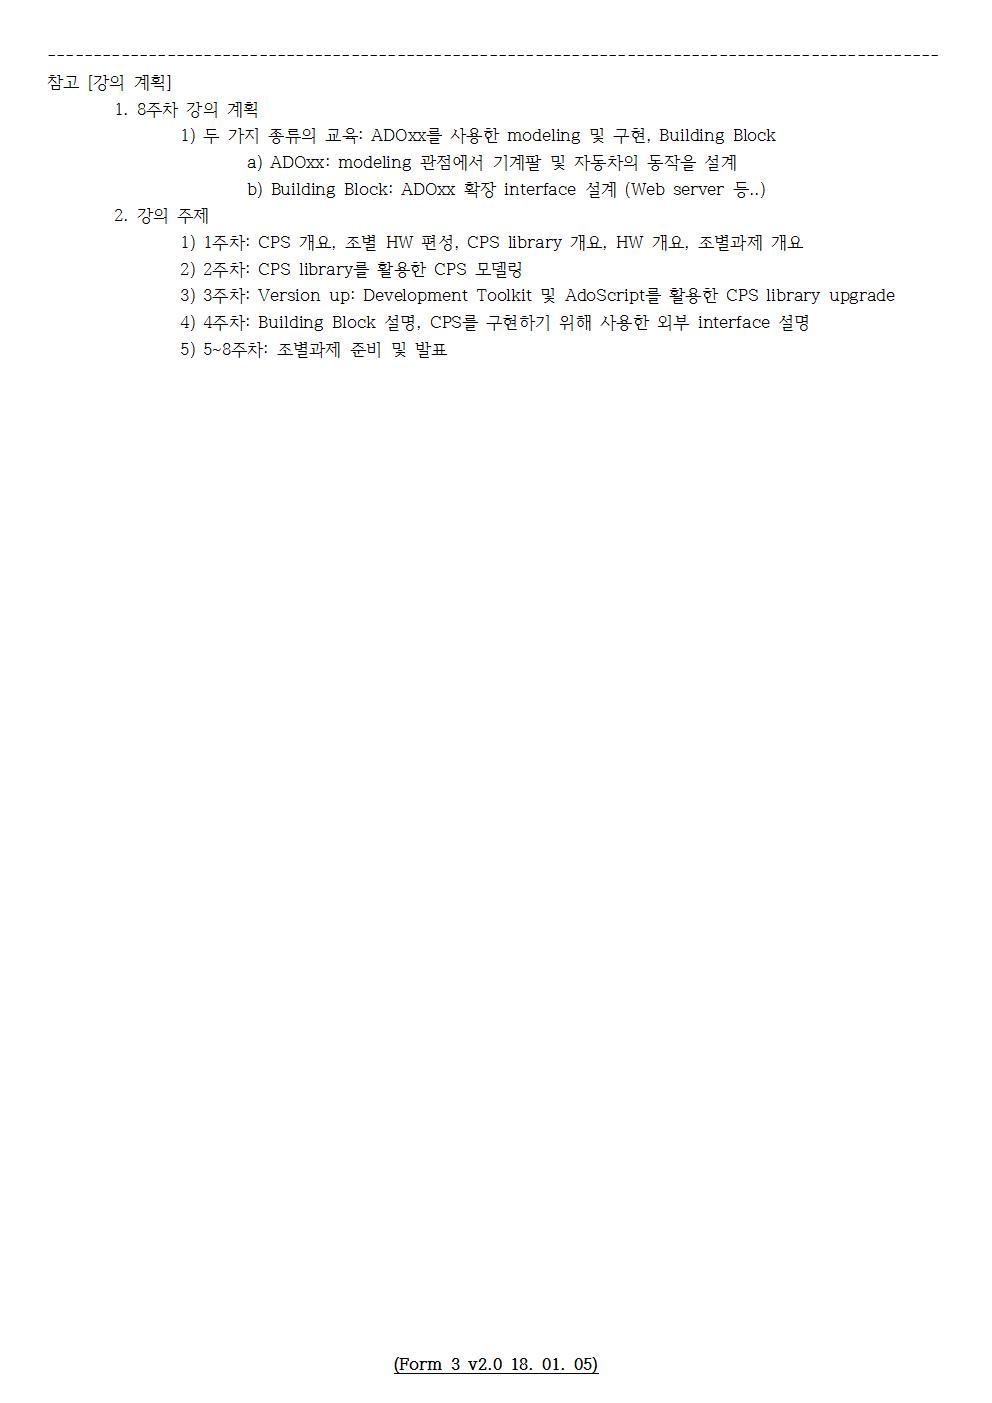 D-[18-004-RD-04]-[우주기초 과제]-[2018-06-25][SH]002.jpg